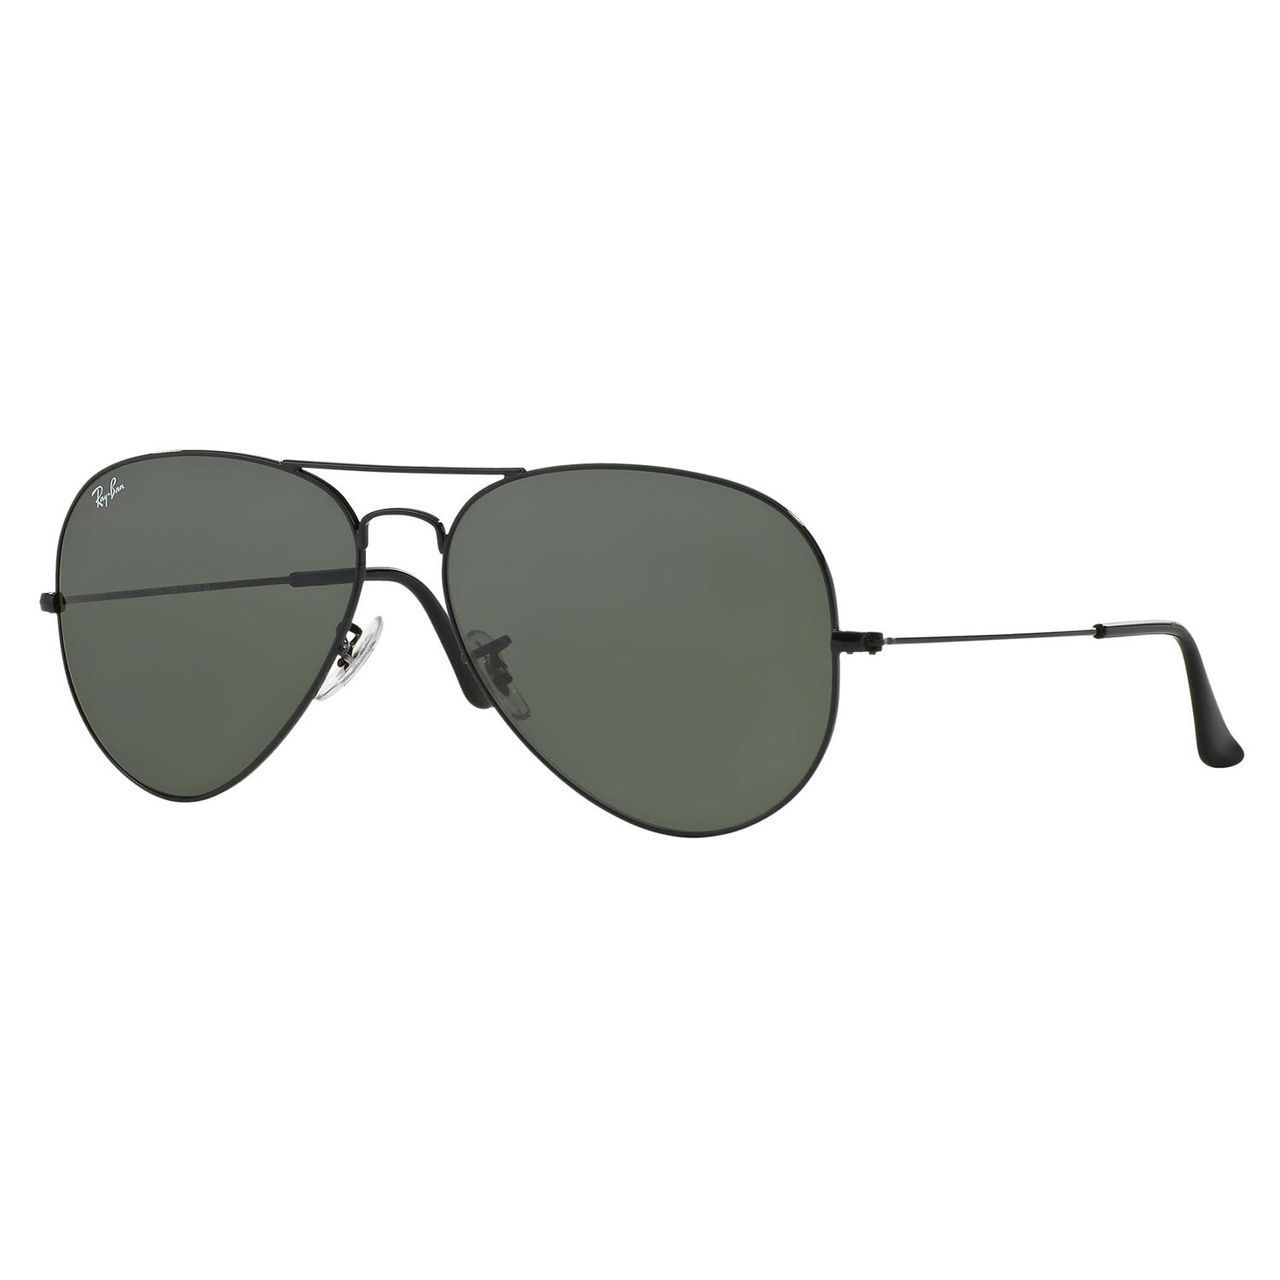 6846285507 Ray-Ban Women s Sunglasses